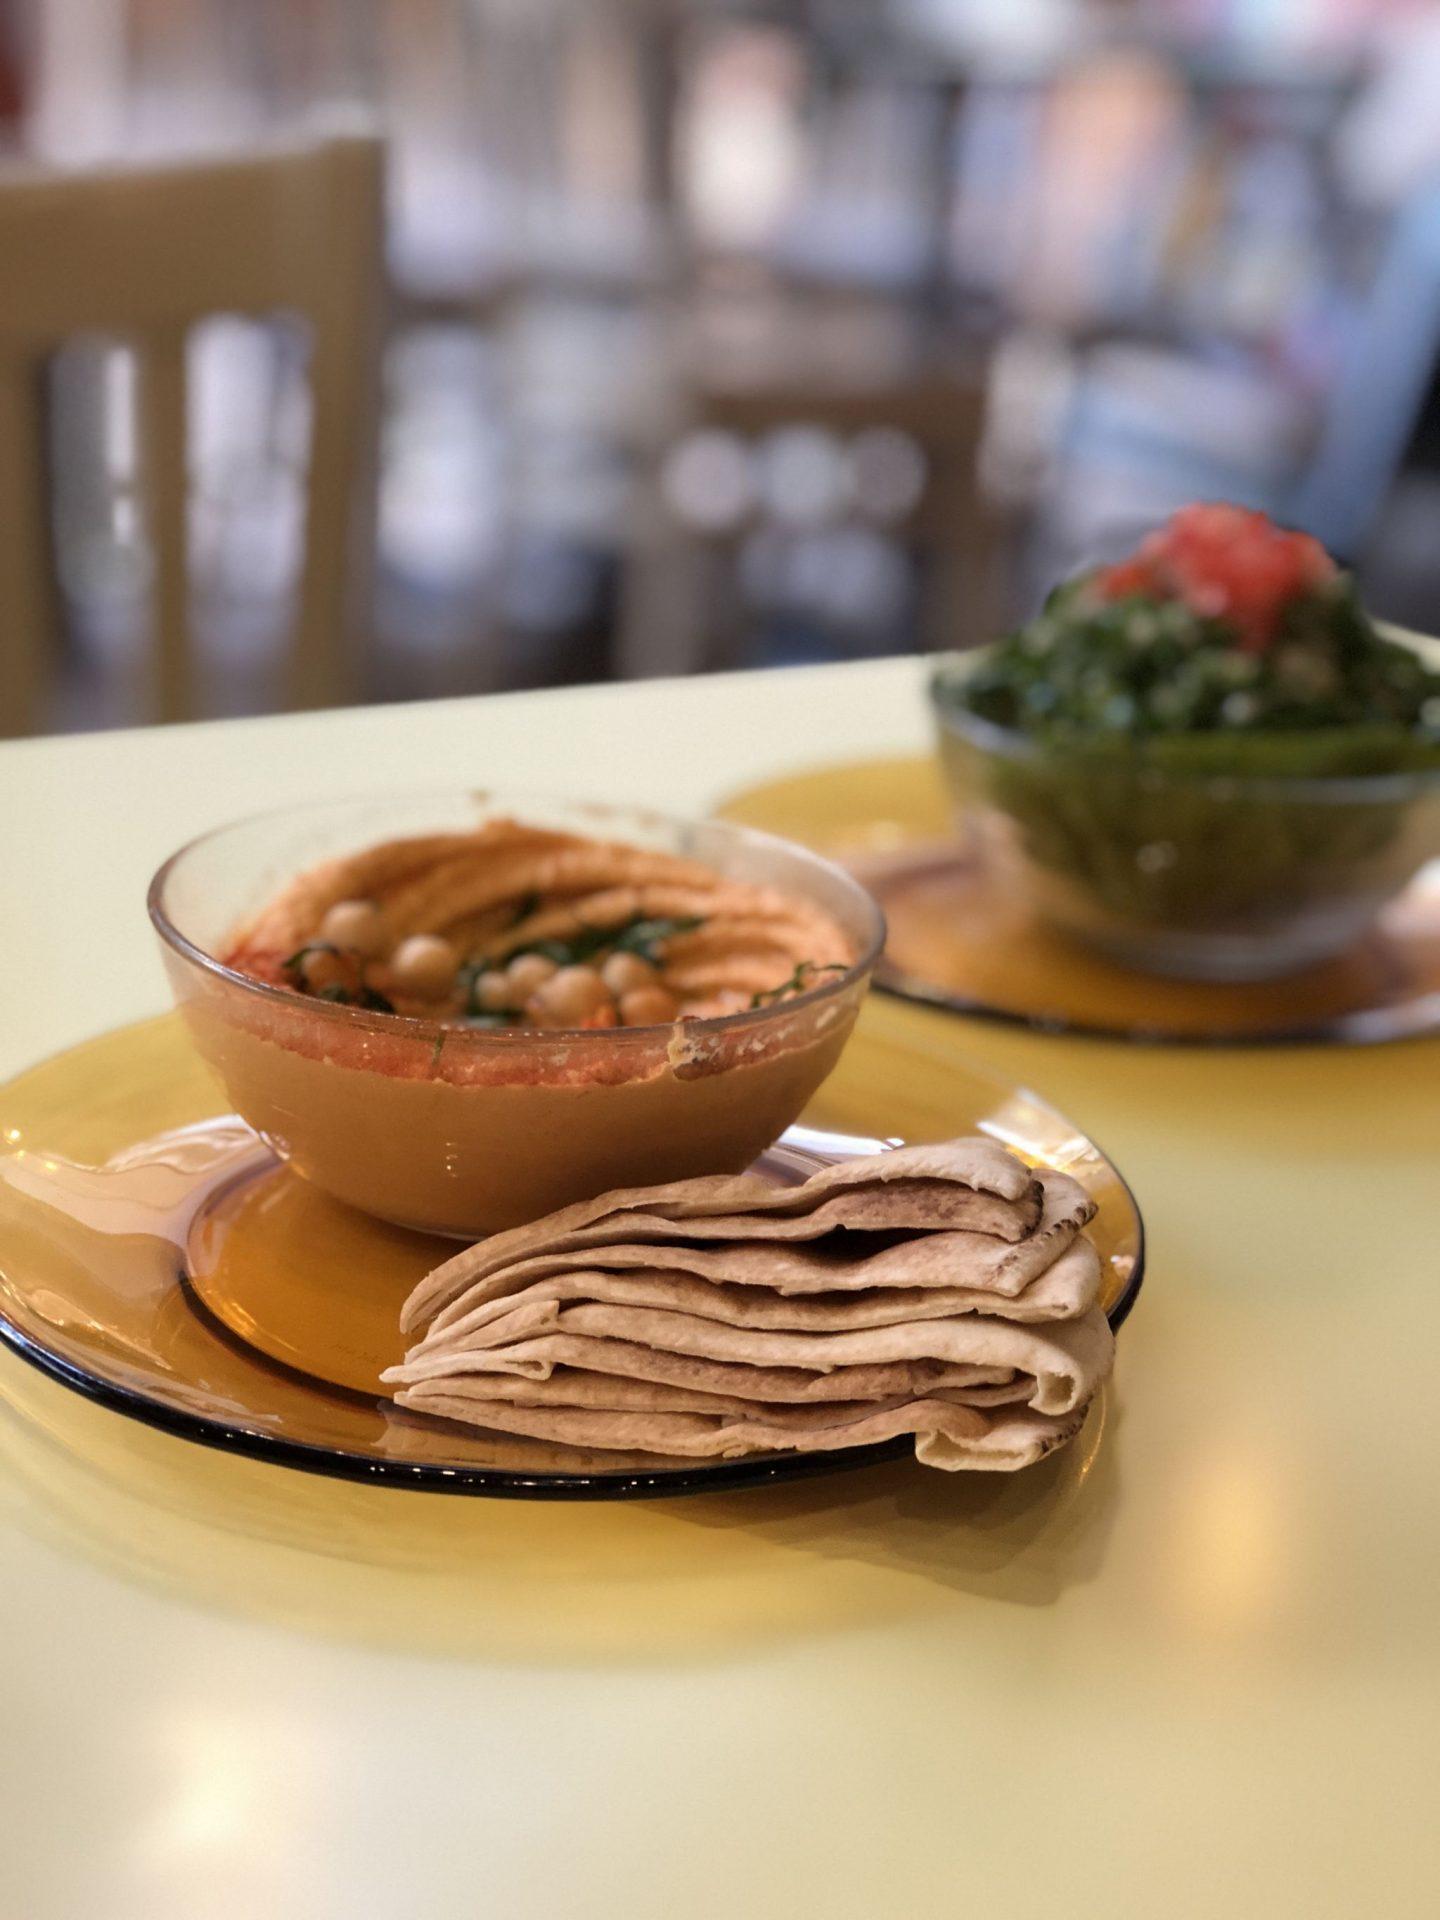 Vegan Menu Launches at Lebanese restaurant Chain